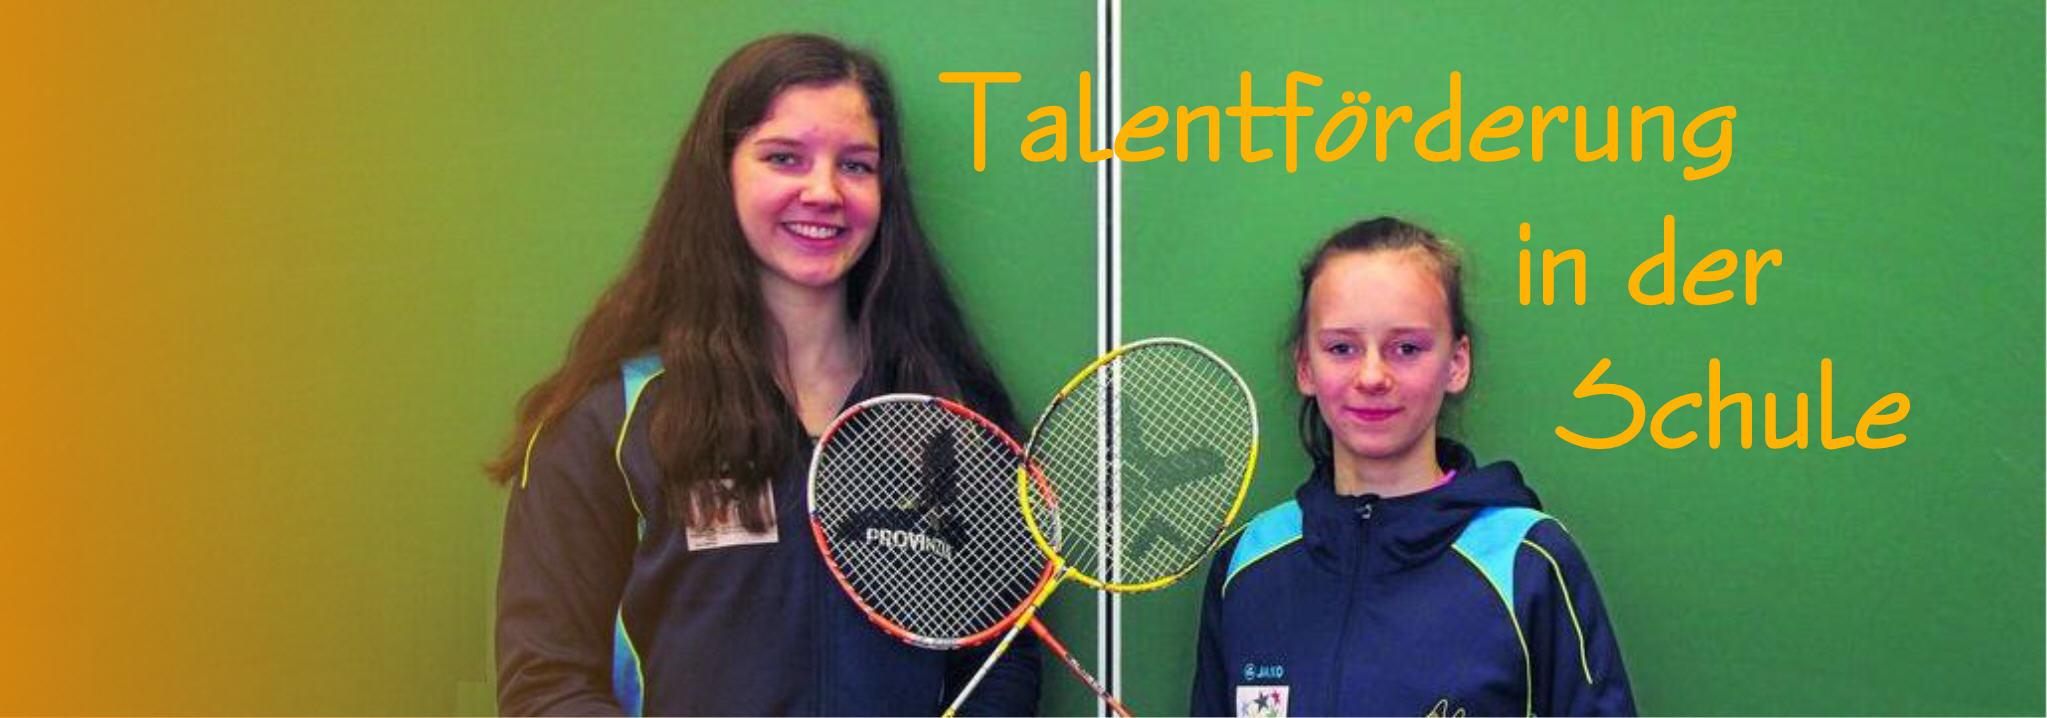 talentförderung_sport